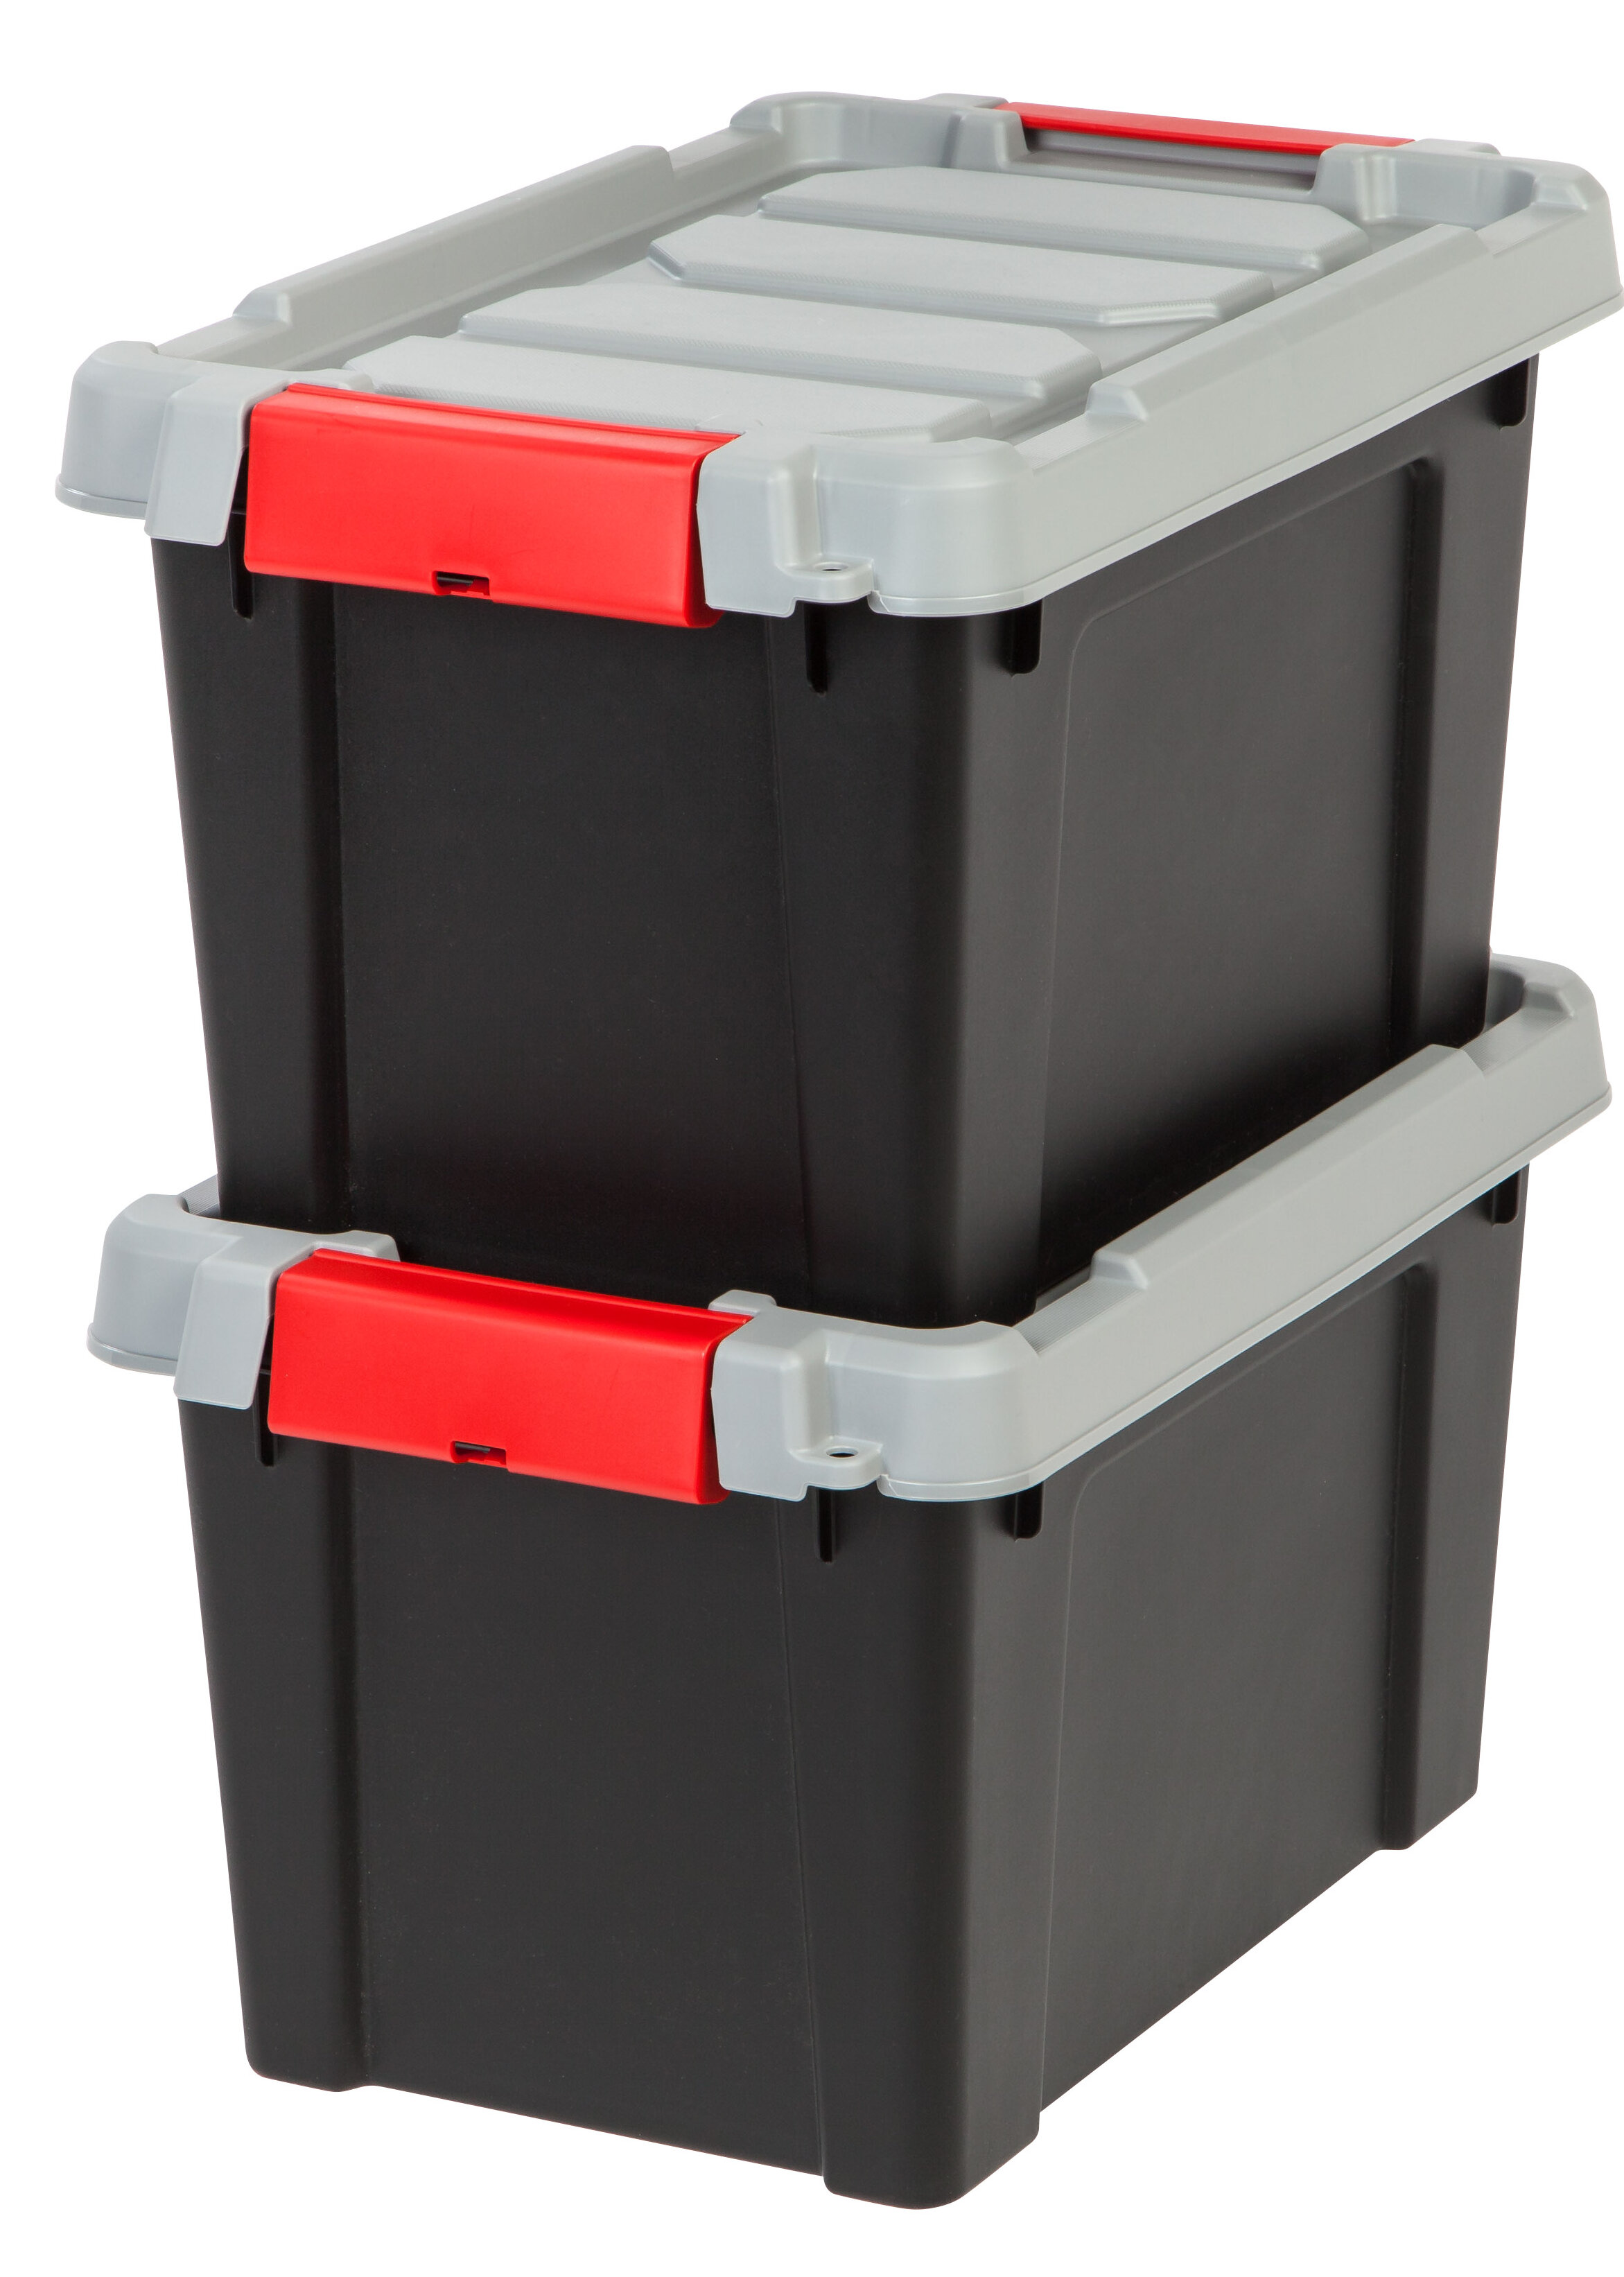 Creative Options Medium Tidy Box Heavy Duty Clear Plastic Storage Compartments